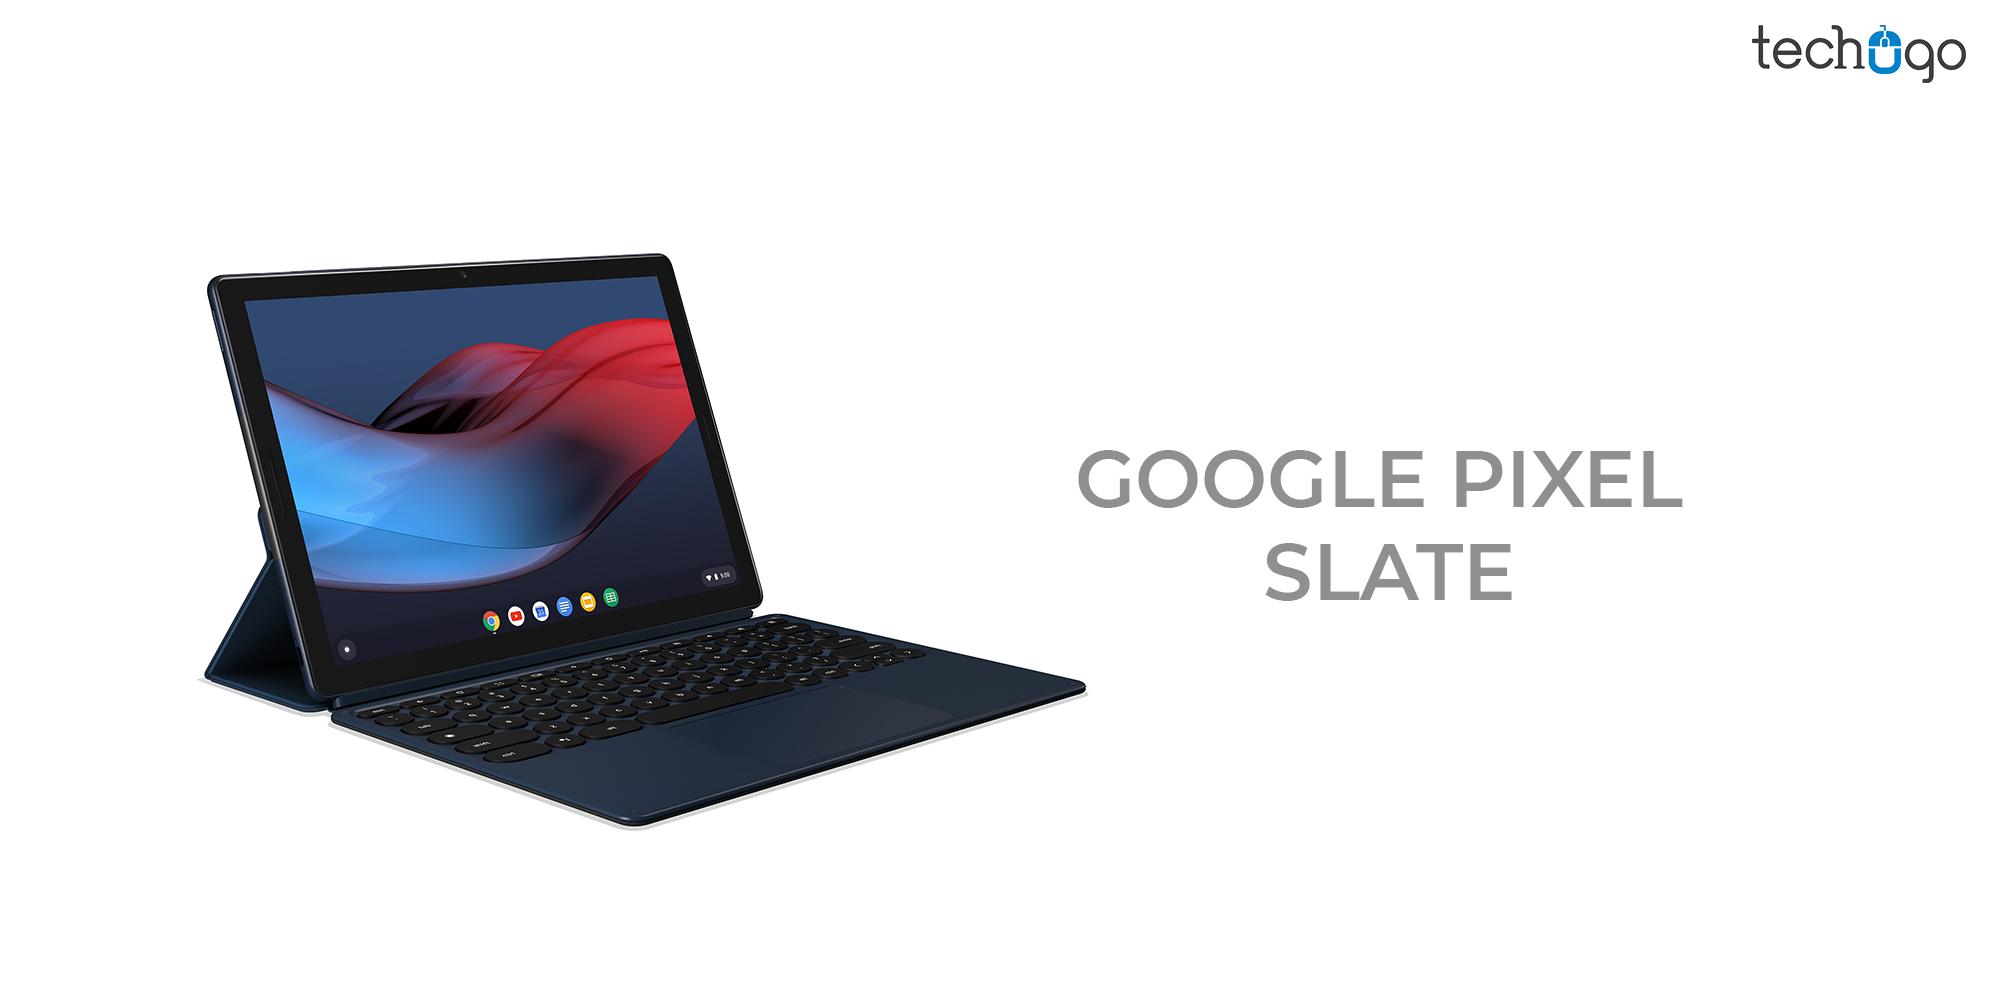 3-Google Pixel Slate